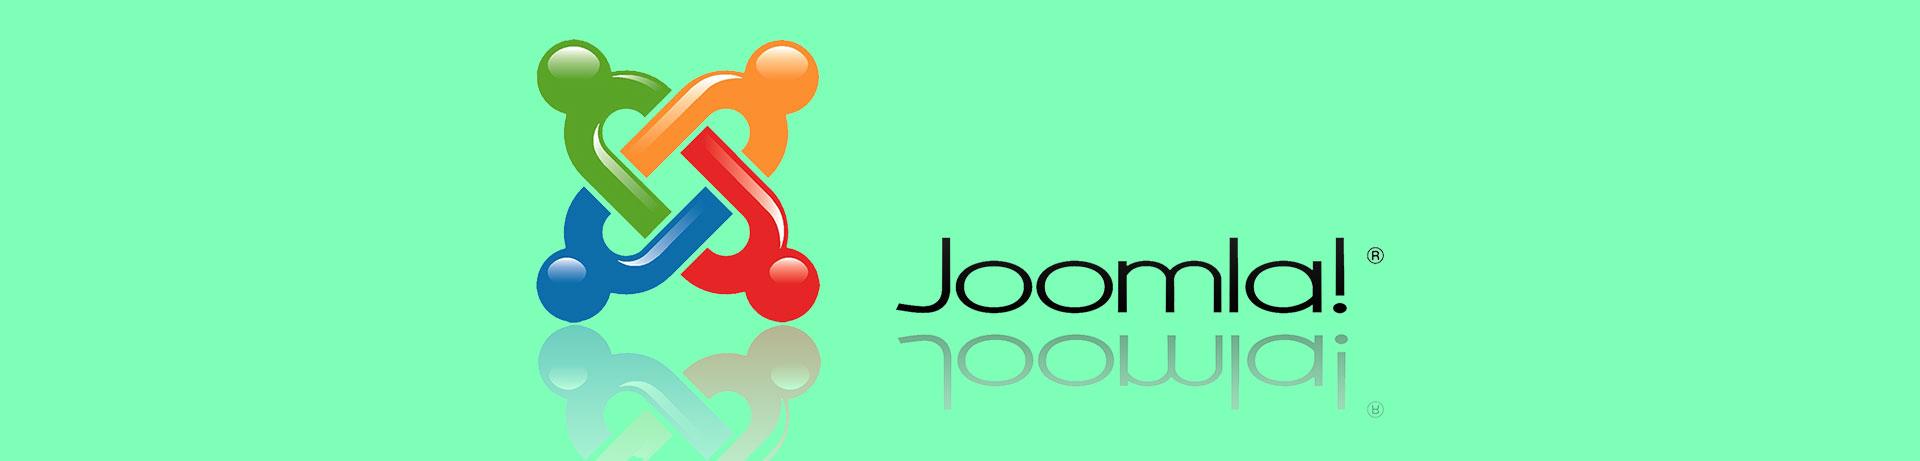 bygga-hemsida-göra-joomla